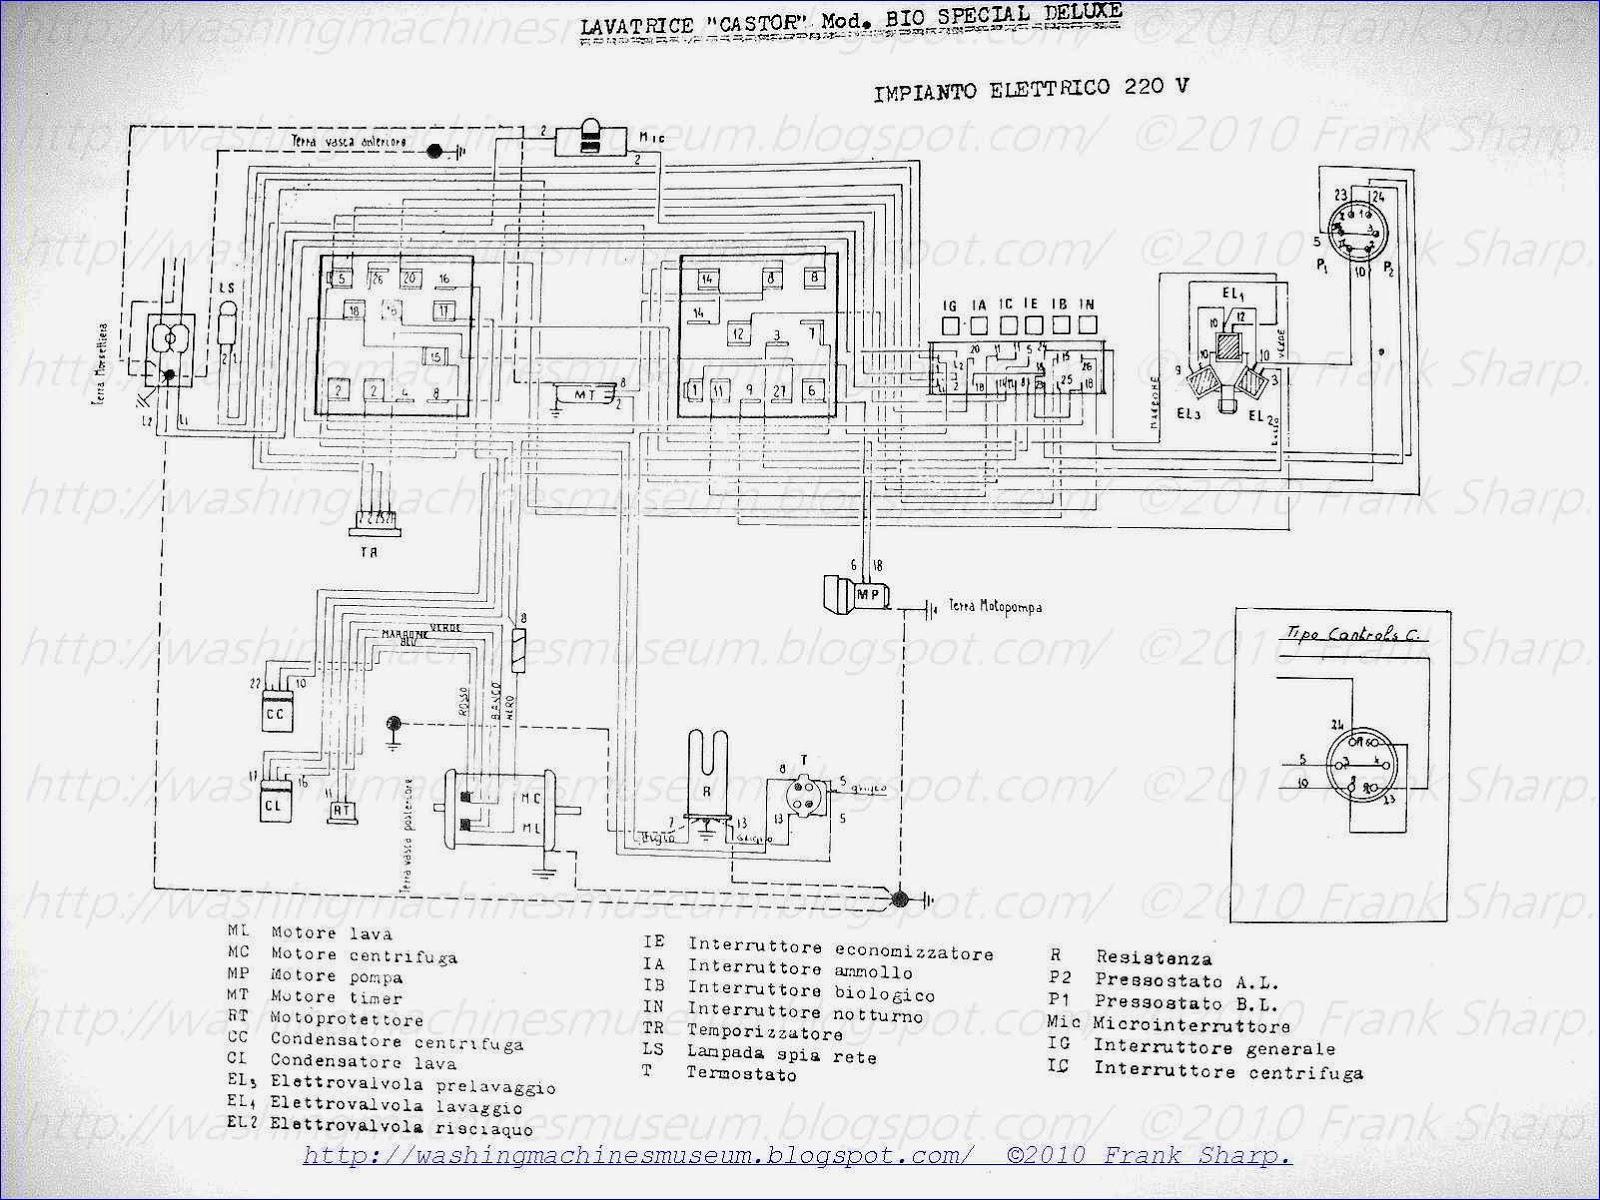 Schema Elettrico Label B50t : Washer rama museum castor mod bio special deluxe